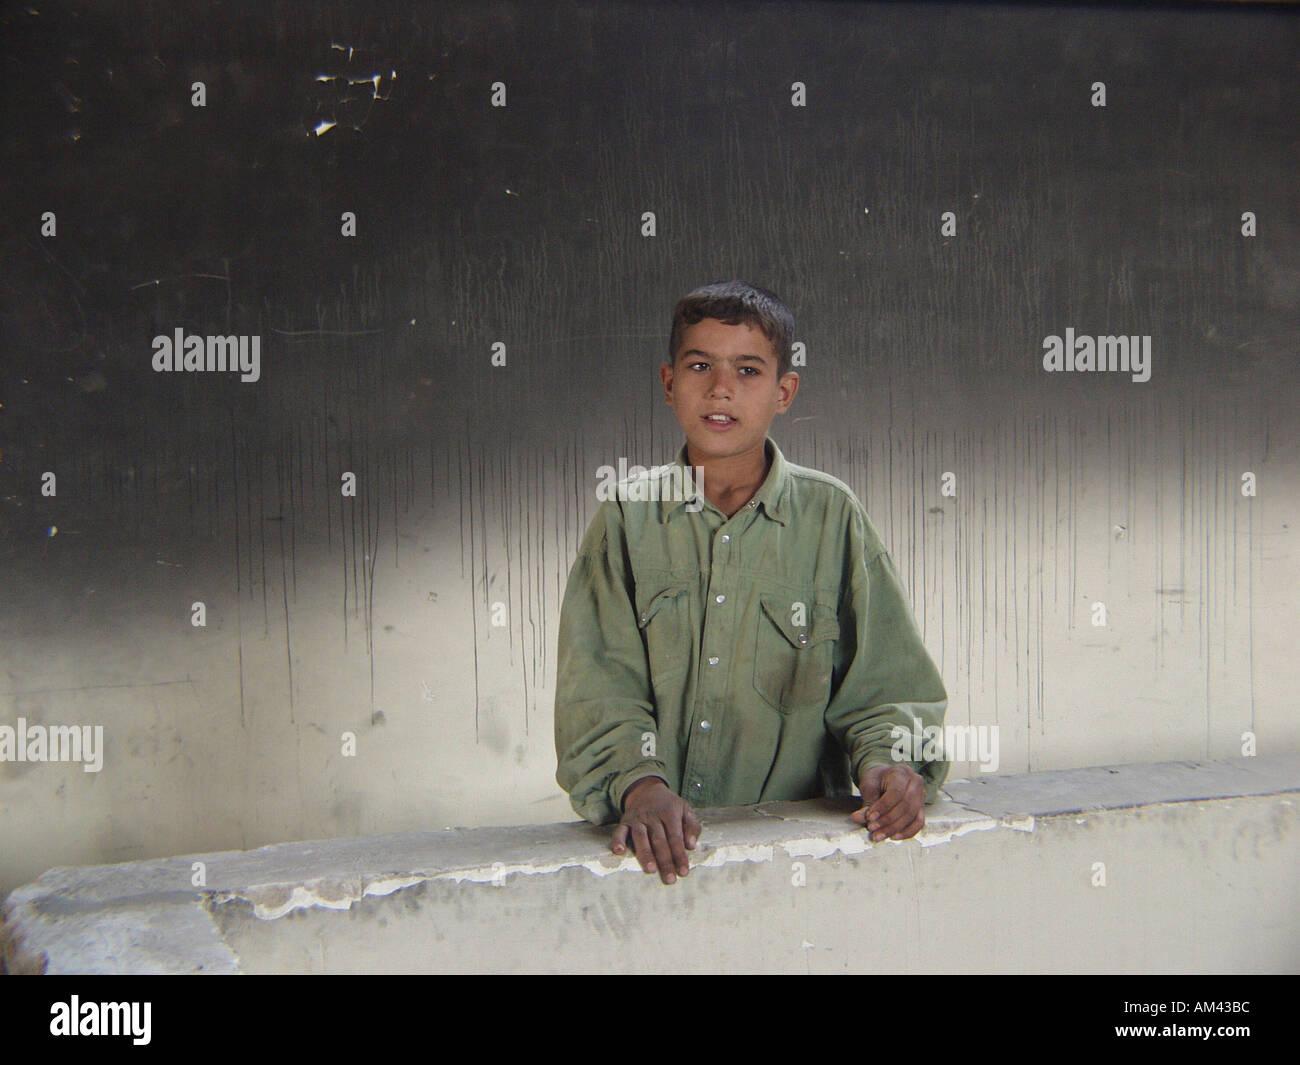 Baghdad - Stock Image